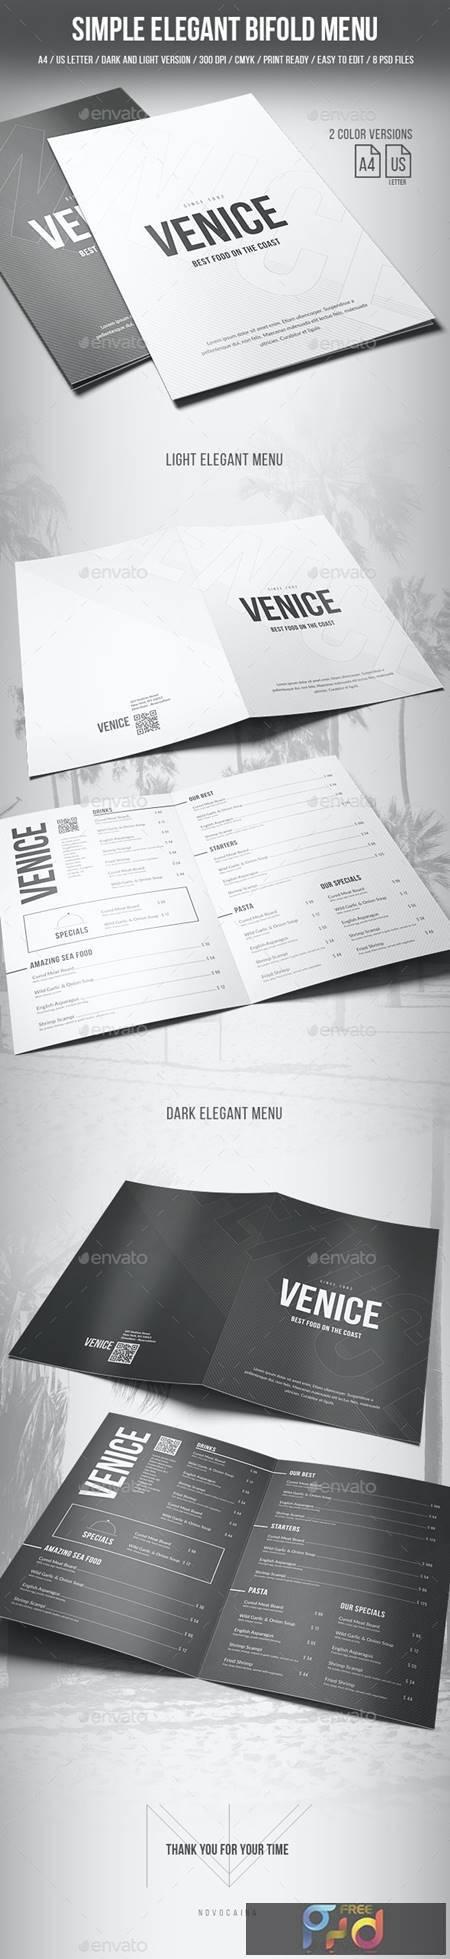 Simple Elegant Bifold Menu - A4 and US Letter - 2 Color Version 20265107 1